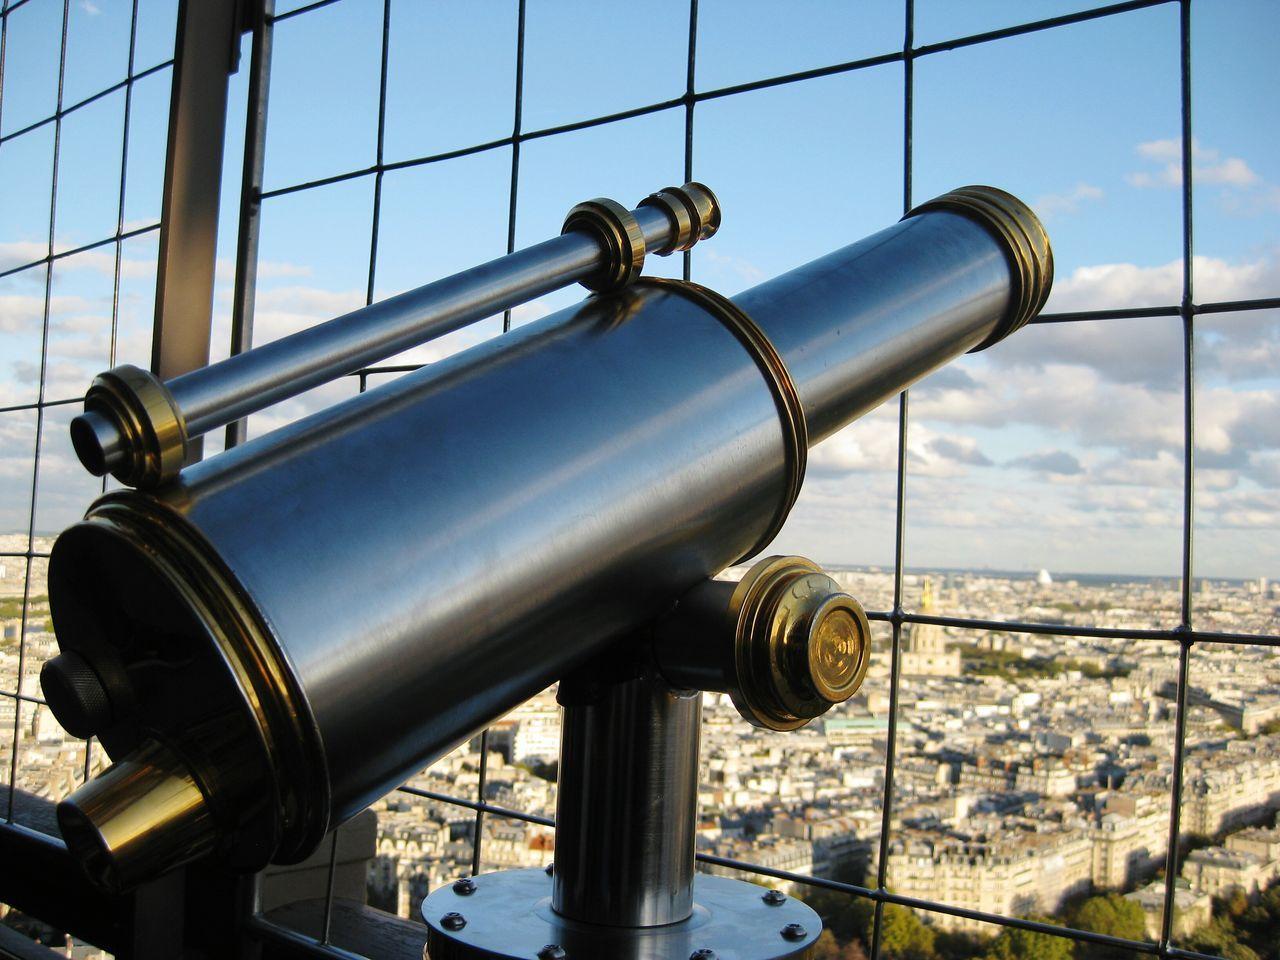 Seeing The Sights Paris Eiffeltower Eiffel Tower Eifel Tower Eifeltower Eifelturm Fernglas Beautiful Sight Enjoying The Sights Sight Sights & Views  Sightglass Close Up Technology